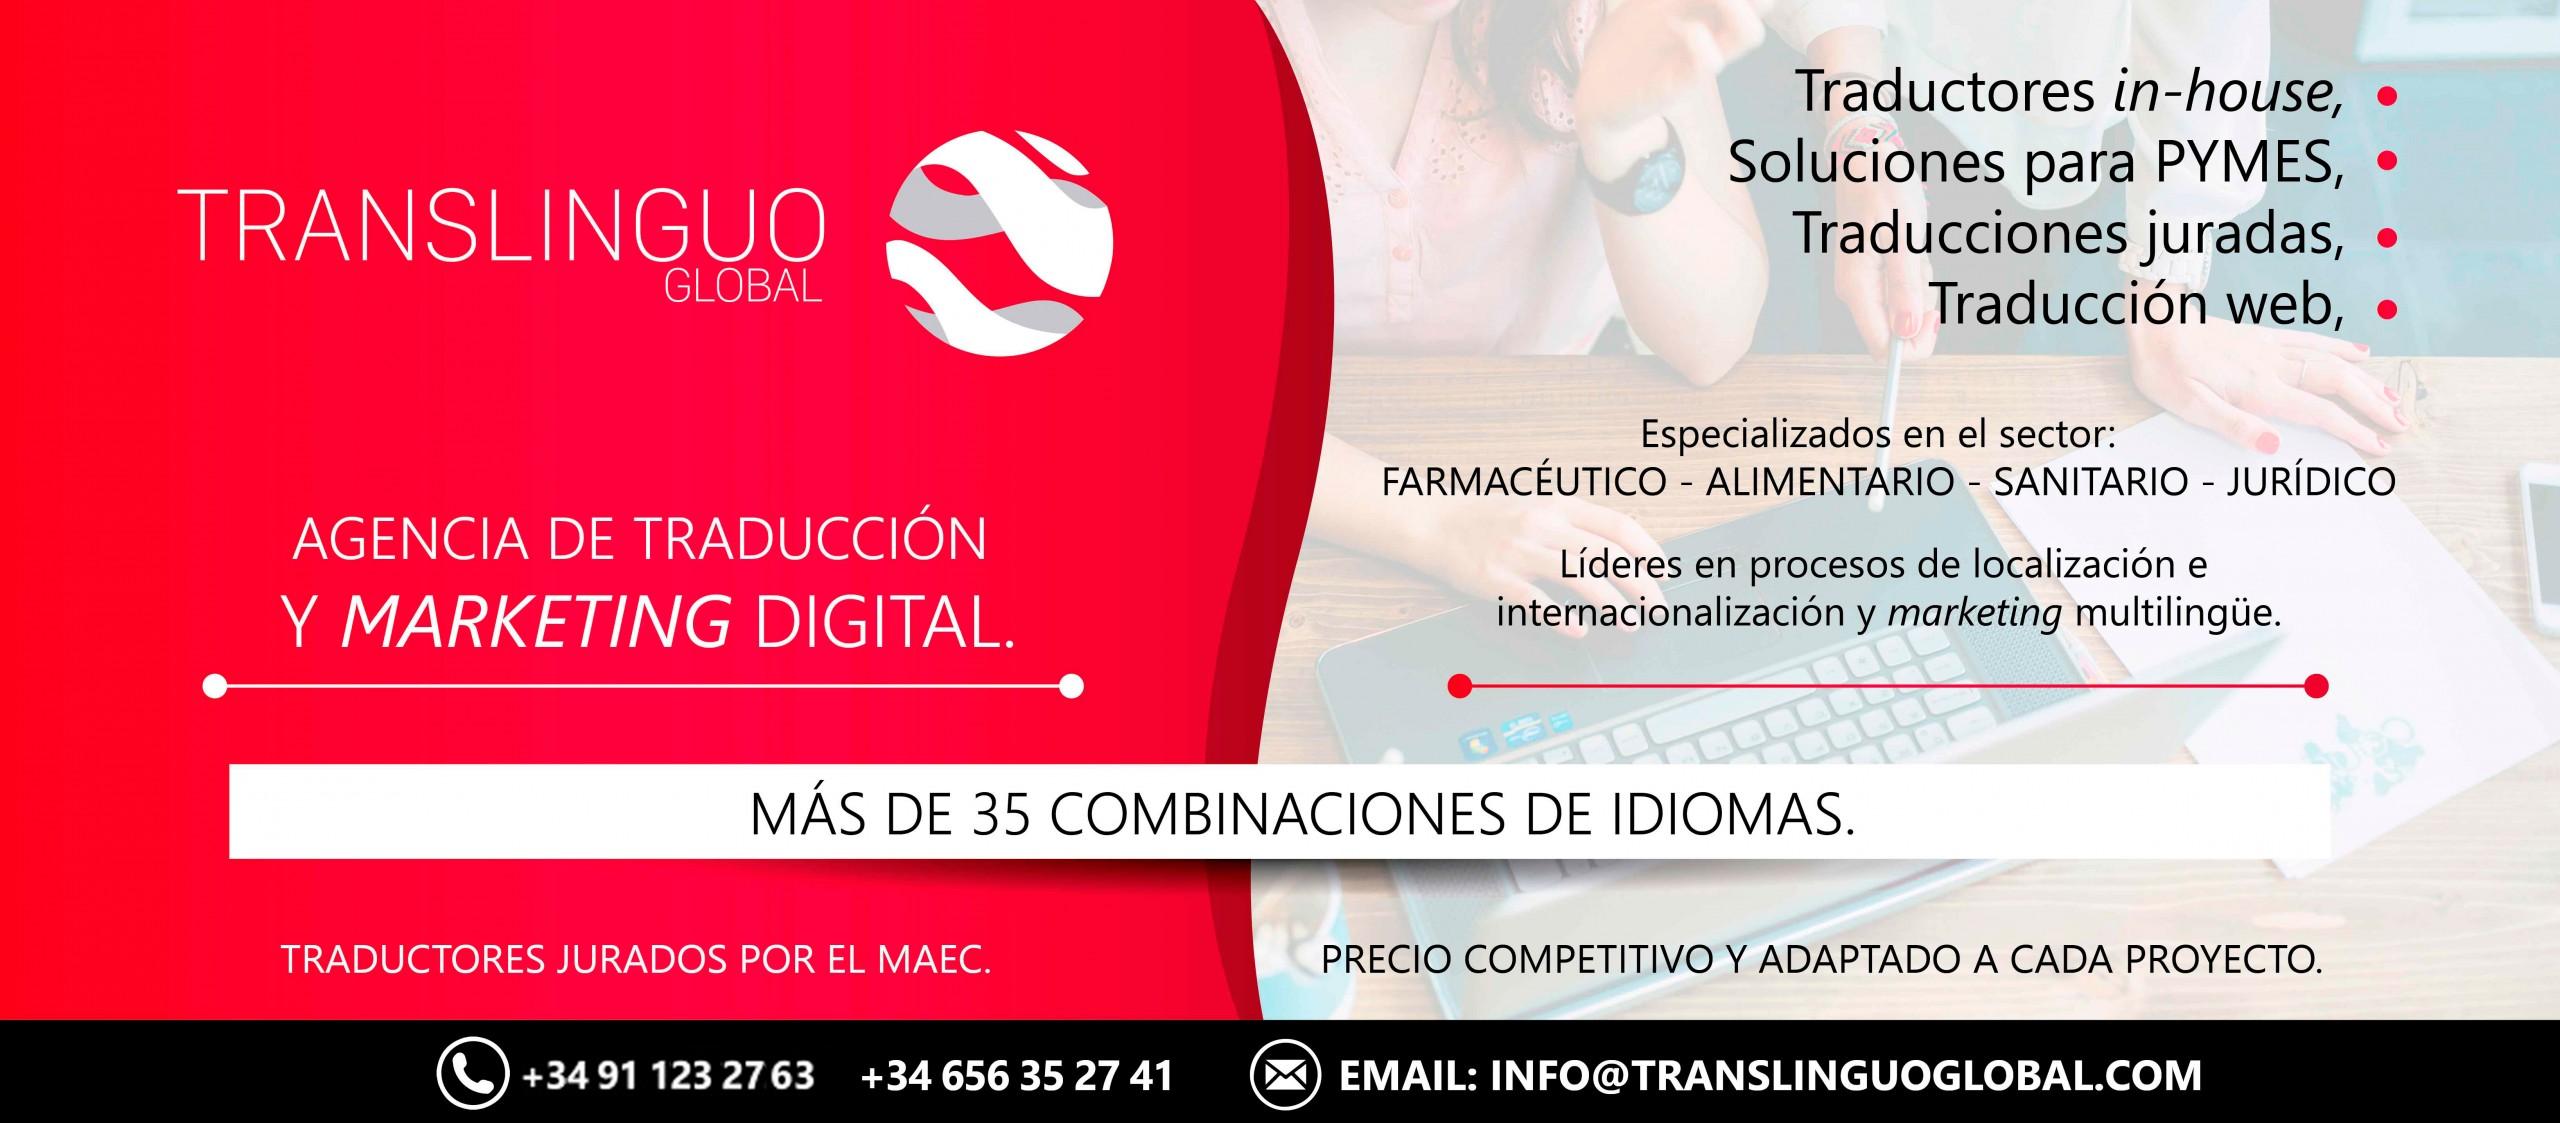 Agencia de traducción en Mallorca principal